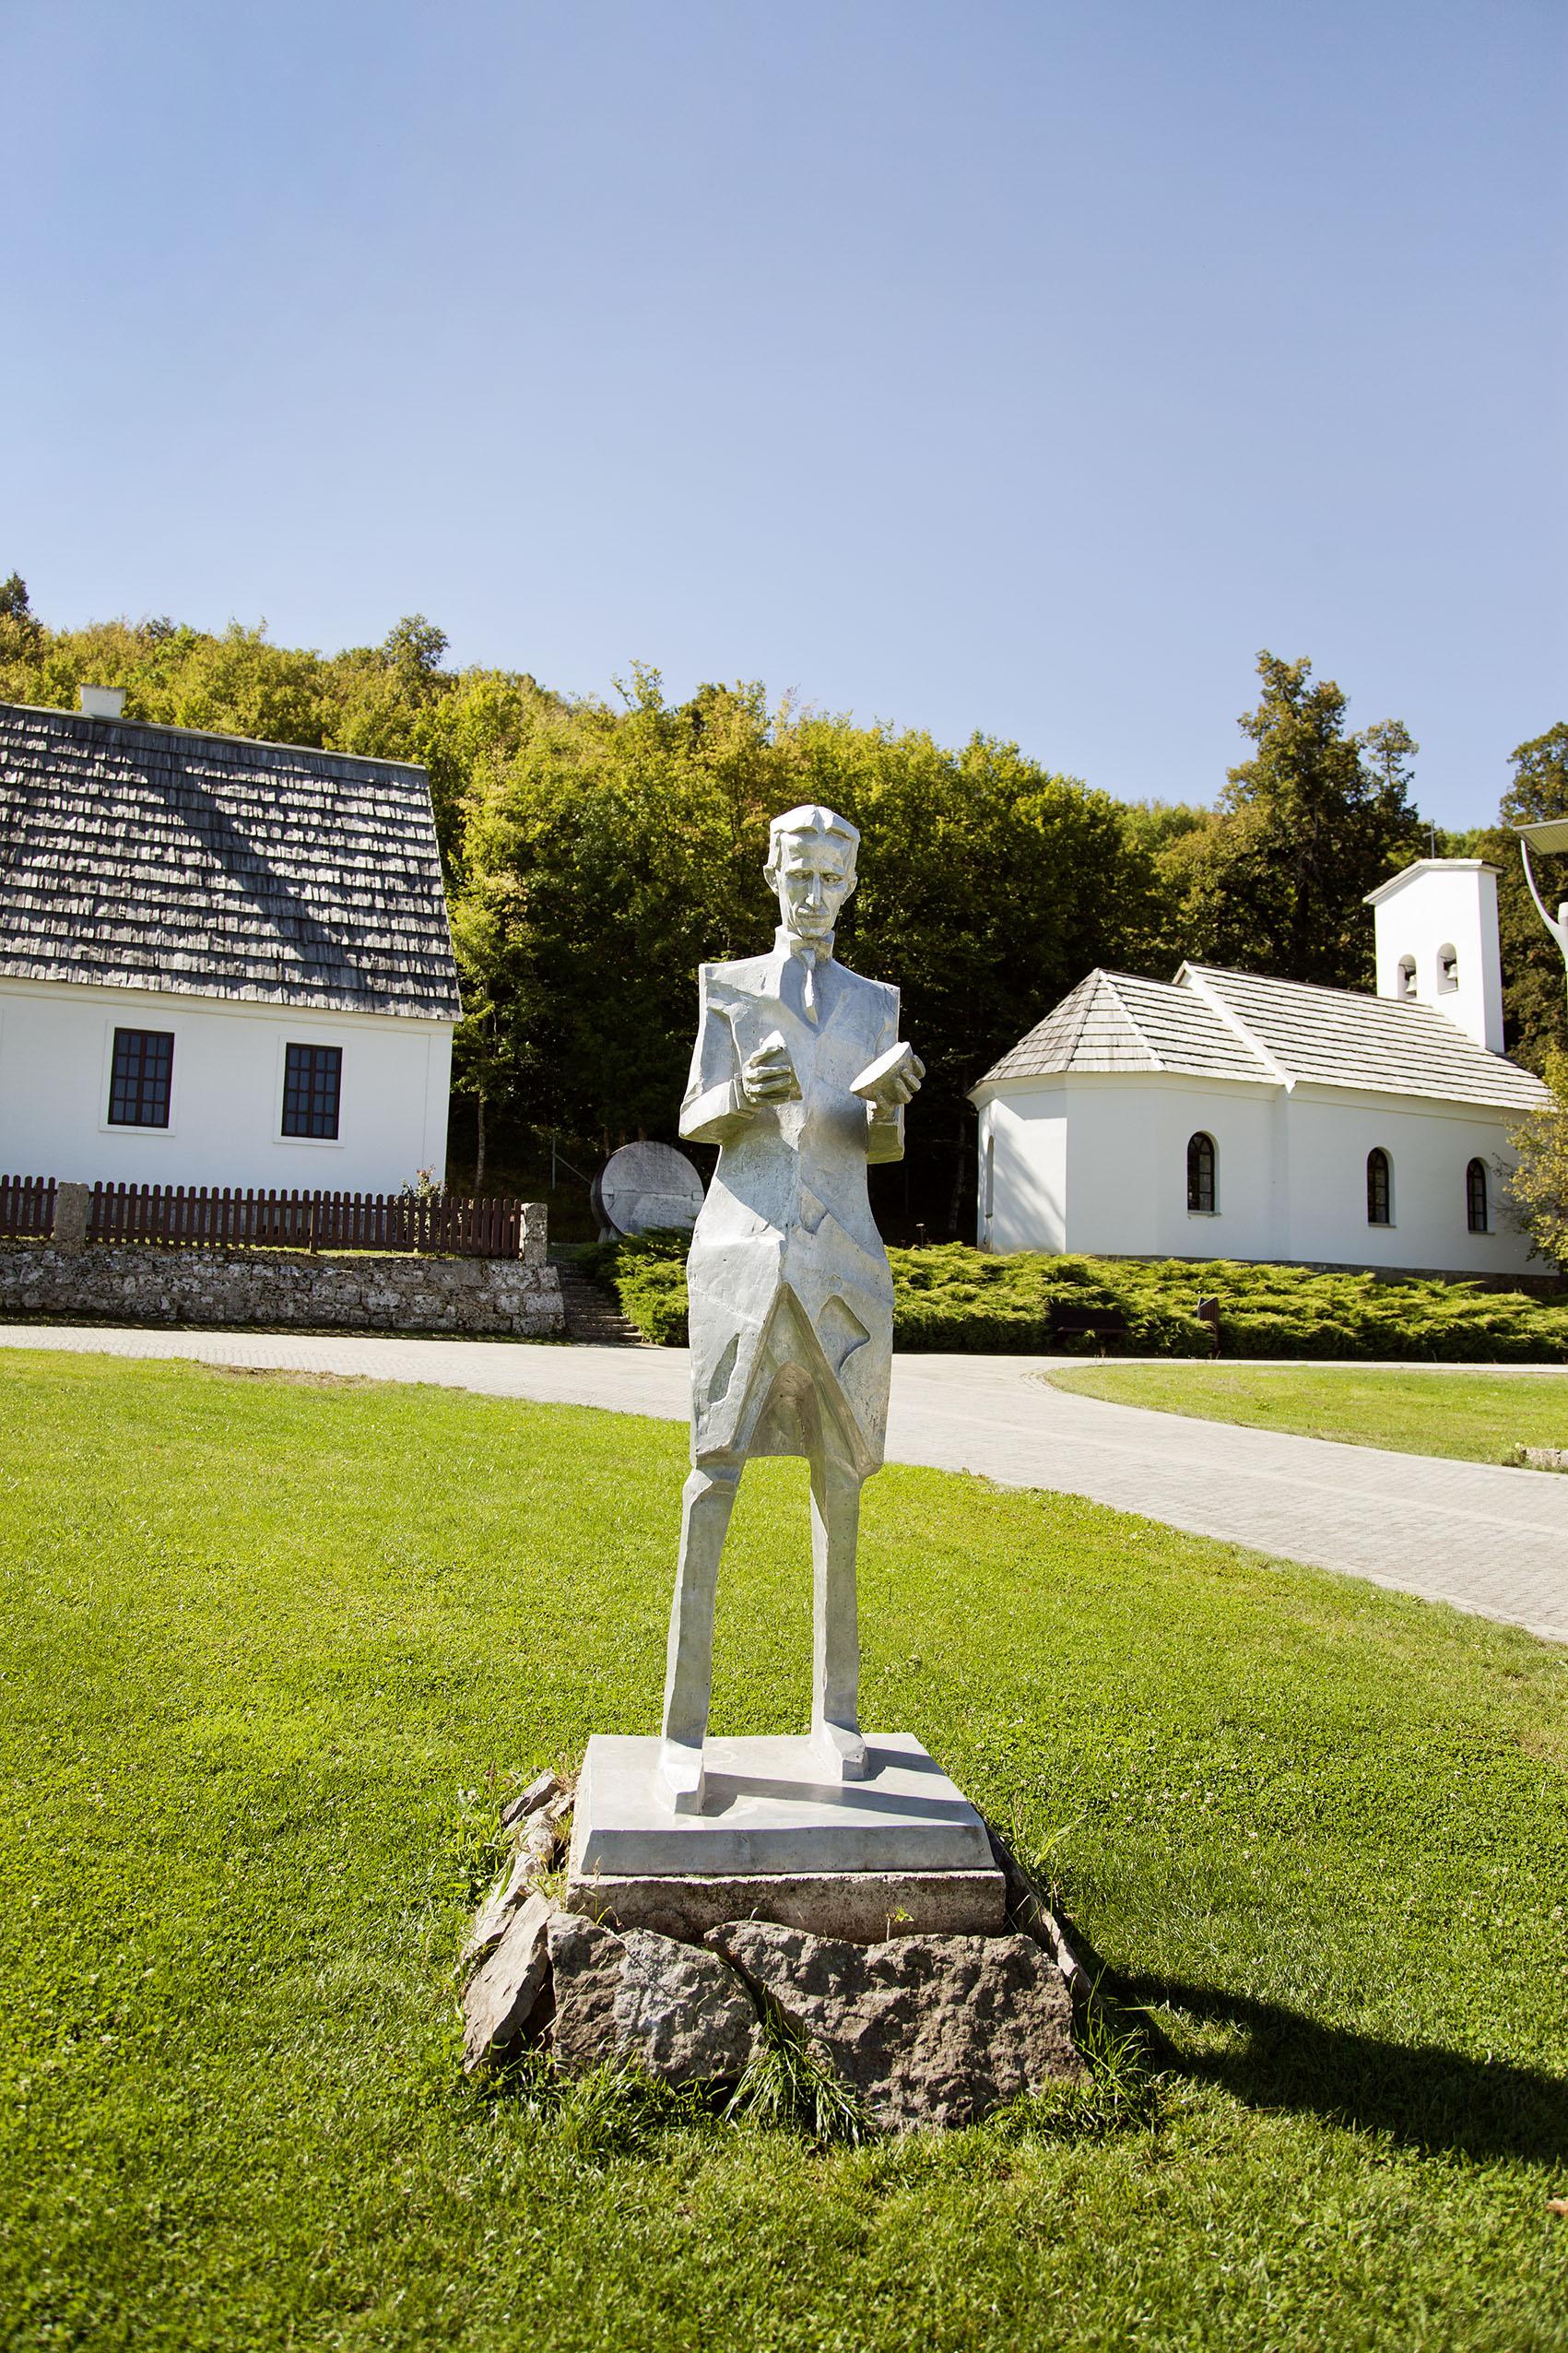 Kroatien; Tesla; Smiljan, Geburtsort von Nikola Tesla; Nikola Tesla Statue mit dem Geburtshaus im Hintergrund